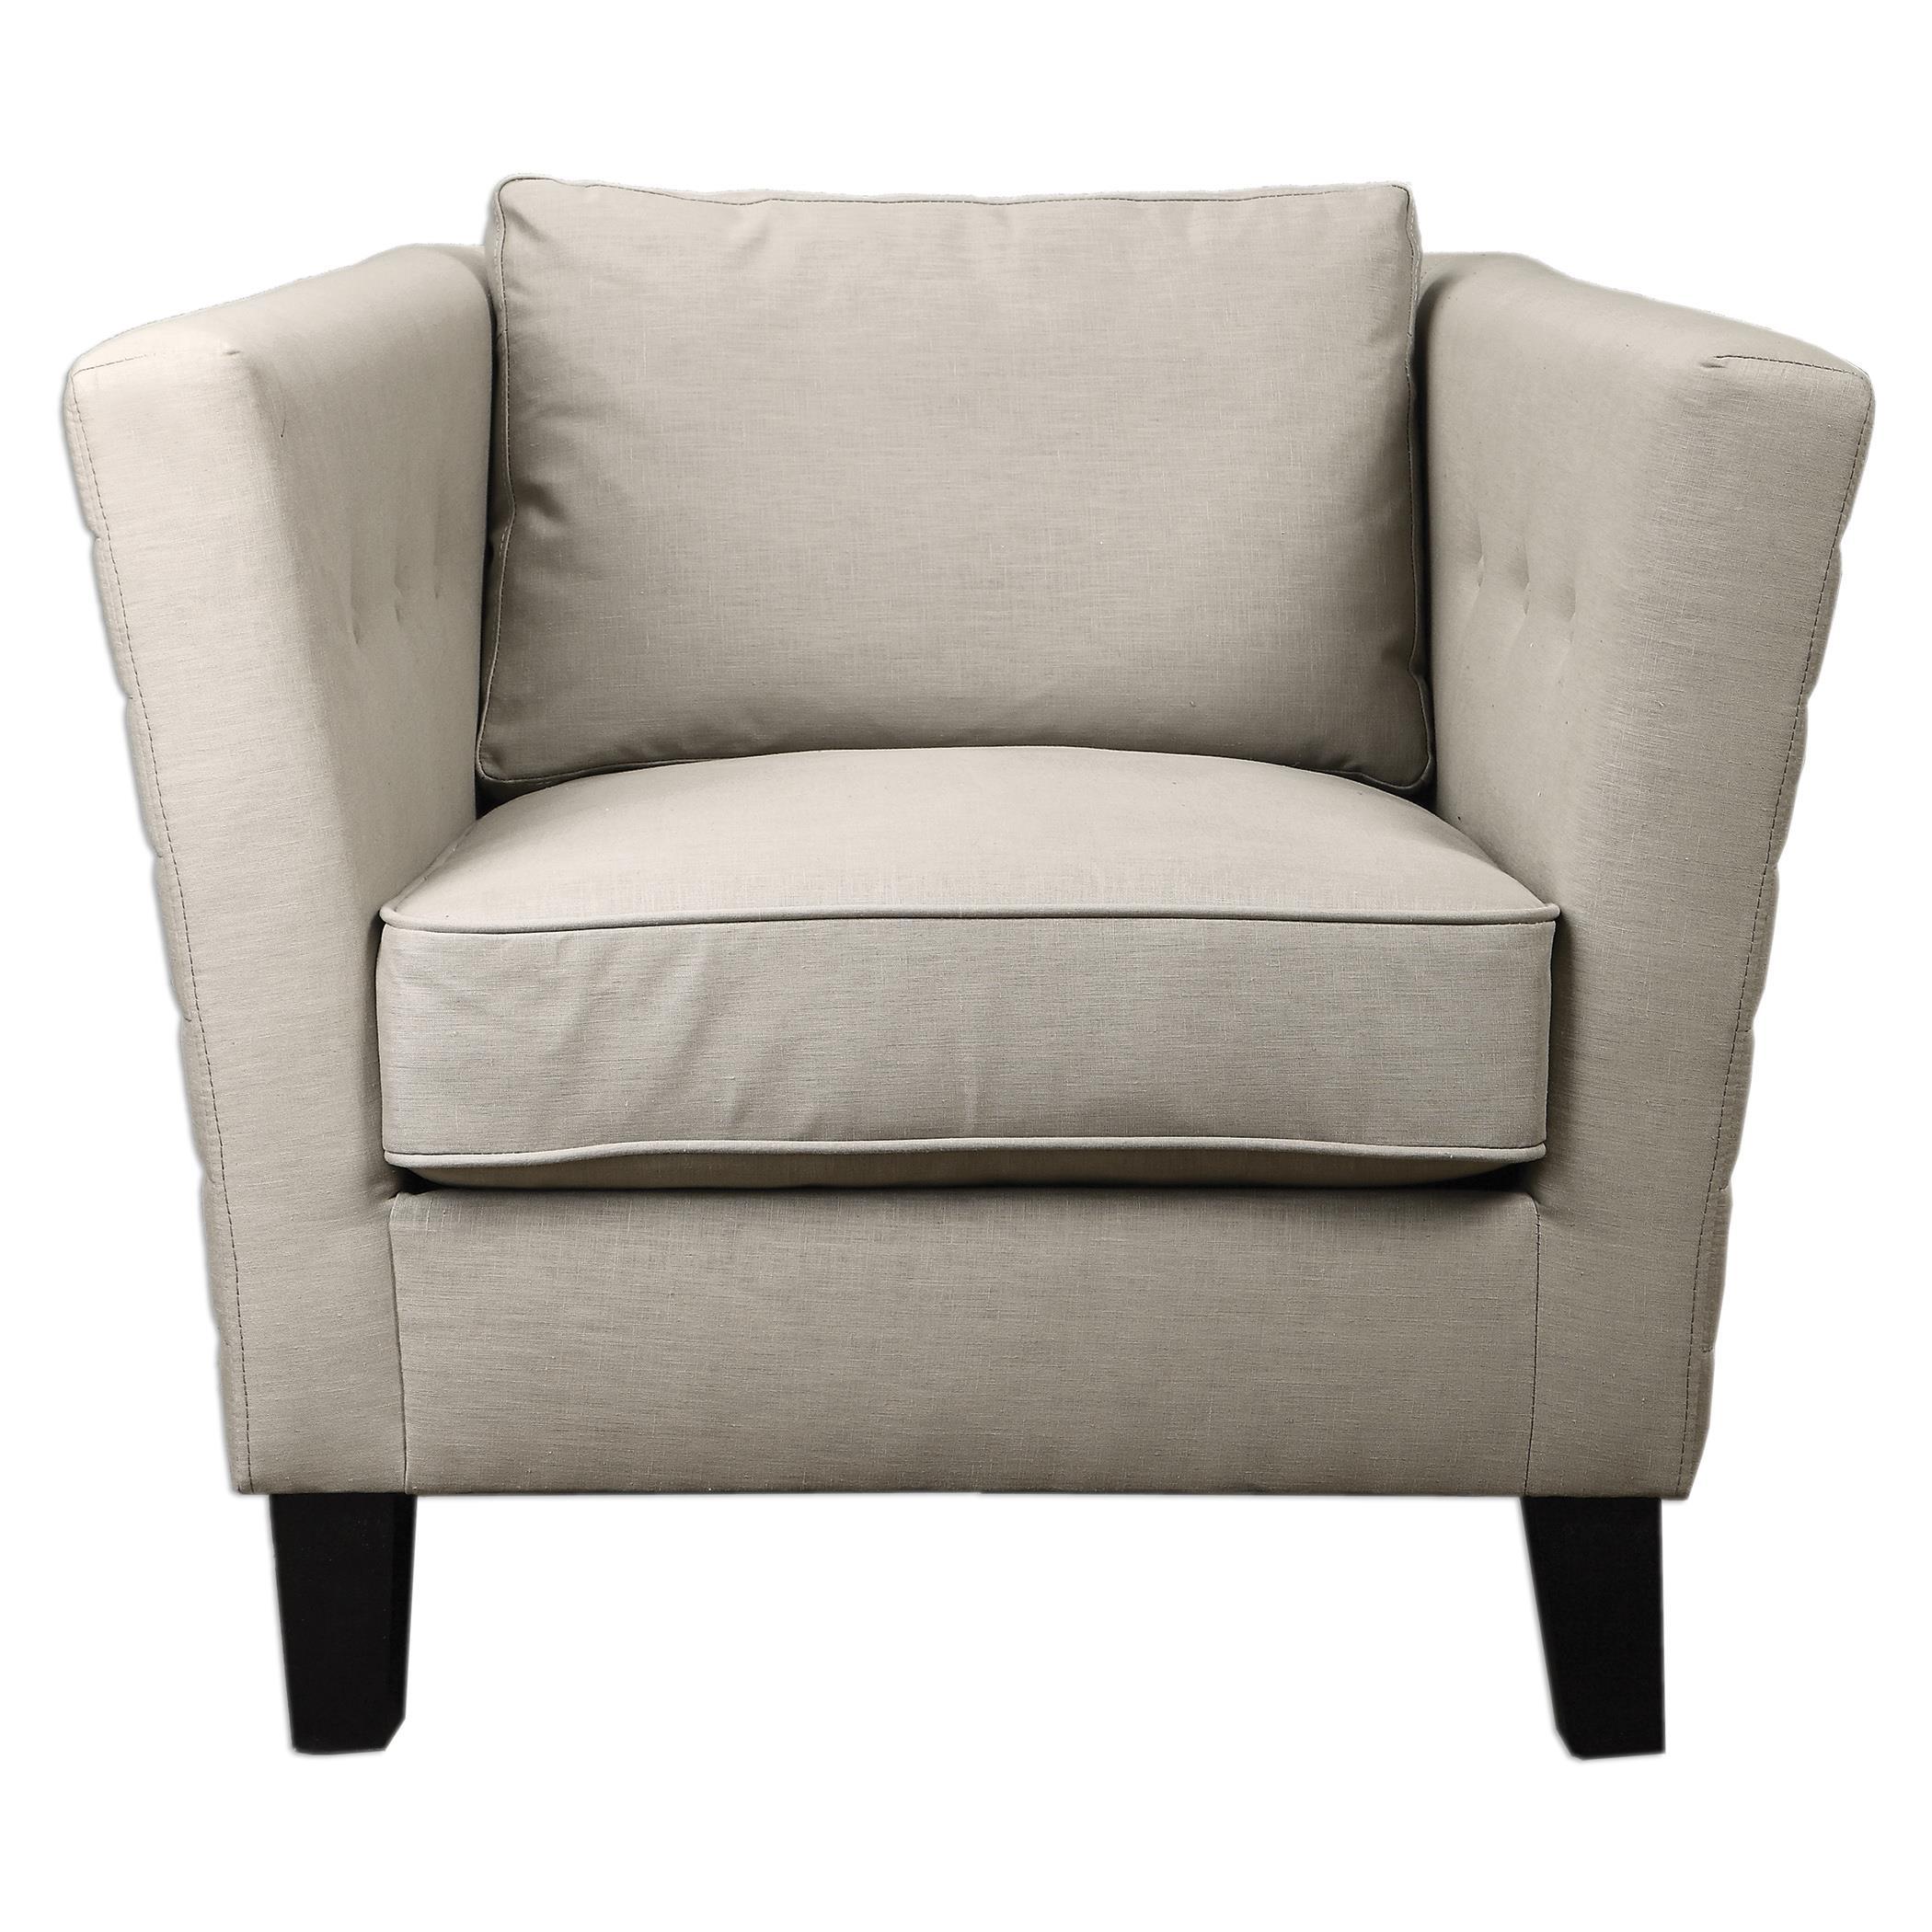 Uttermost Accent Furniture Izaak Modern Armchair - Item Number: 23250